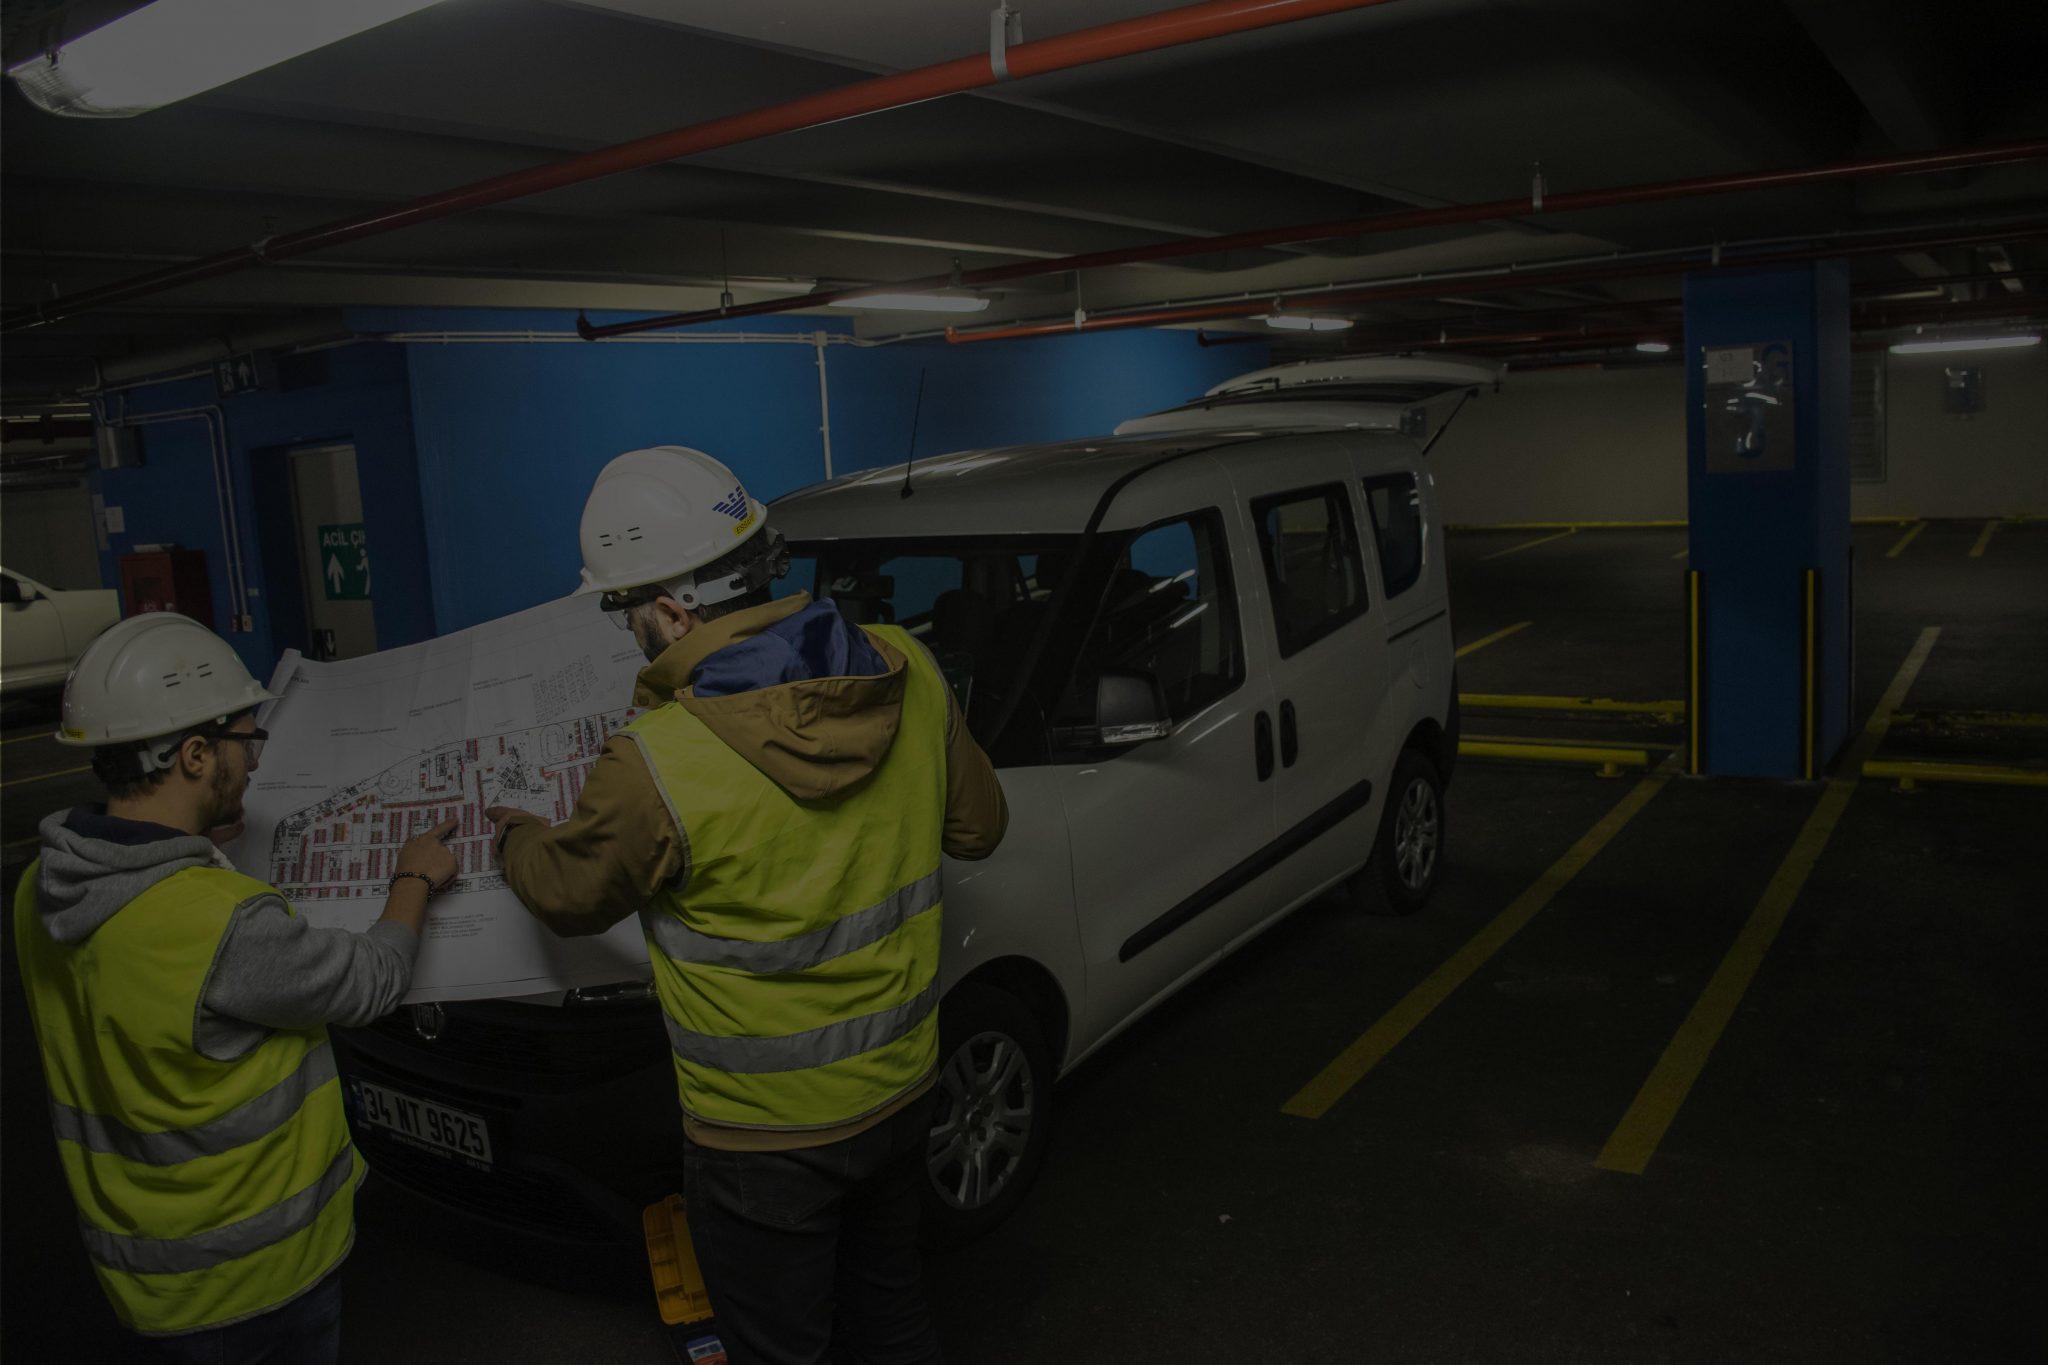 parkmaestro best parking lot guidance system